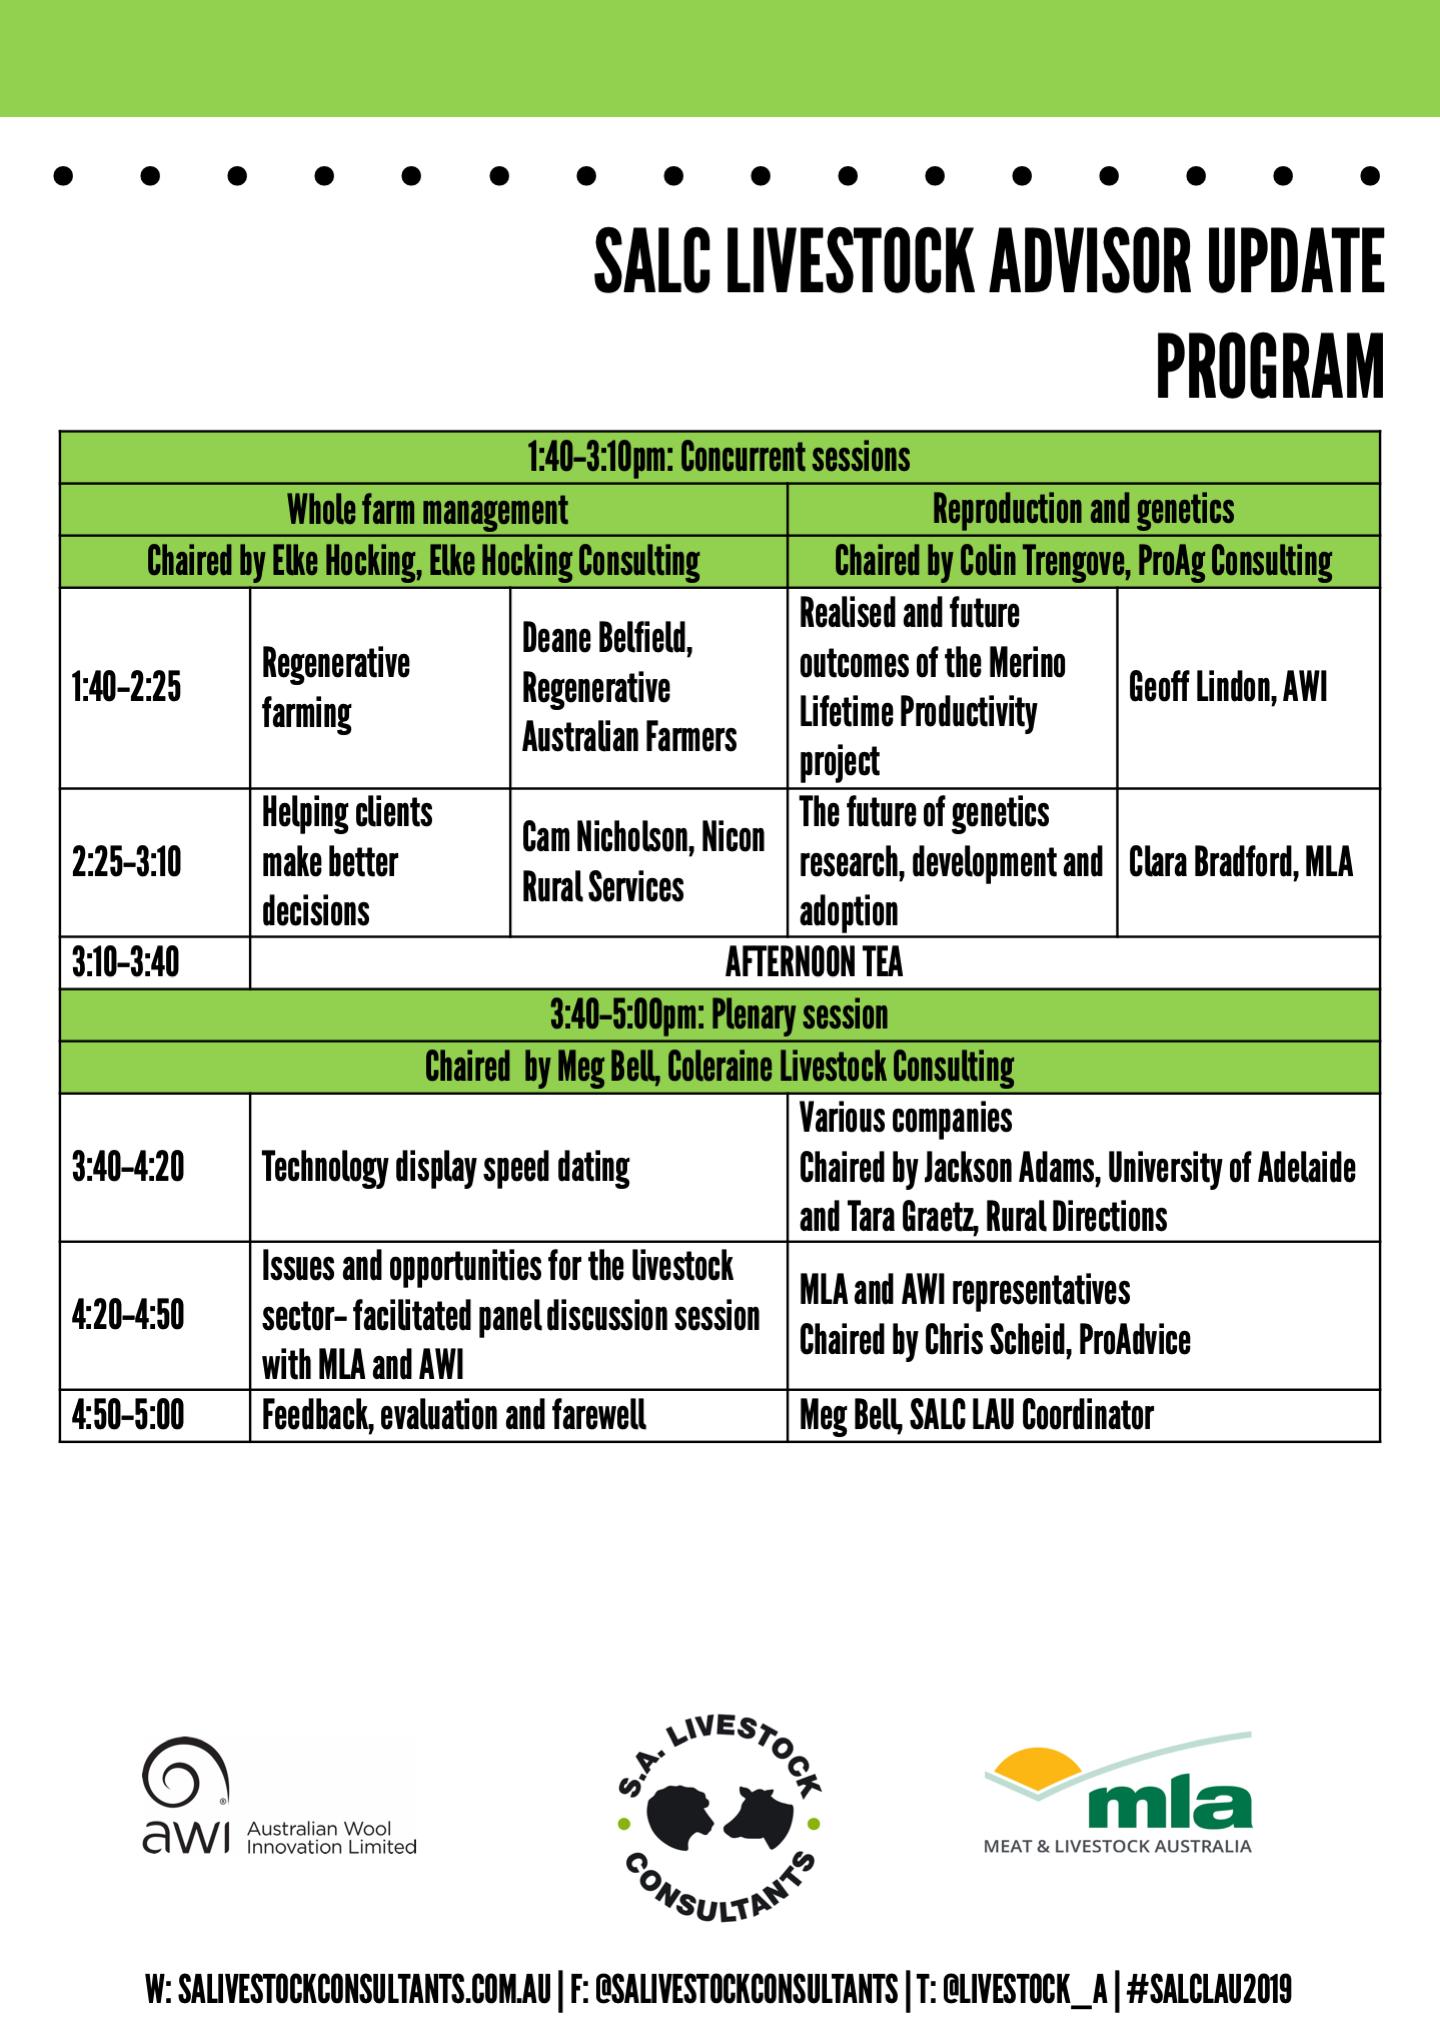 20190810 Program for publication FINAL 2.png